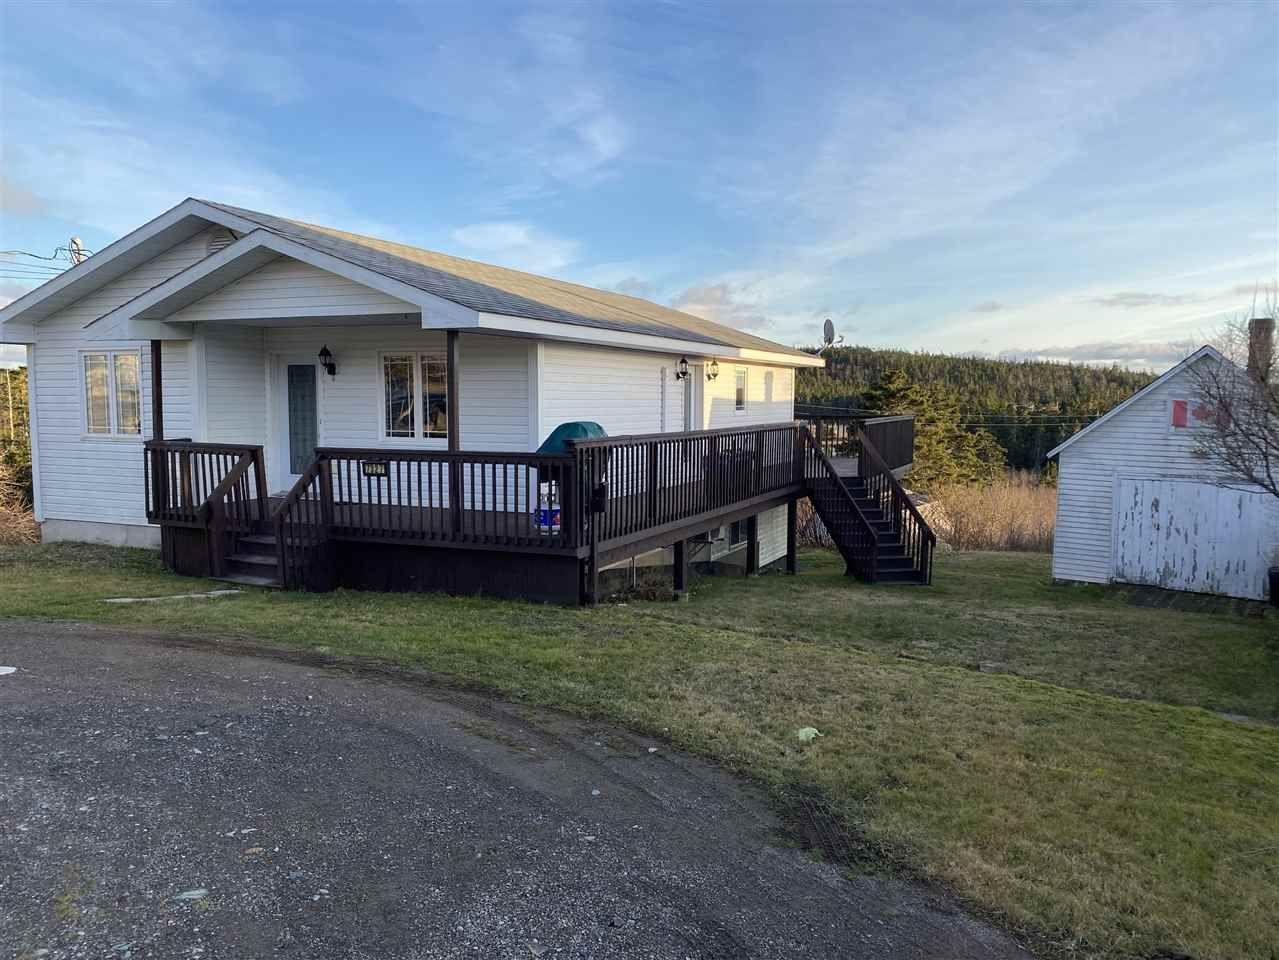 Photo 2: Photos: 7327 Main Street in Louisbourg: 206-Louisbourg Residential for sale (Cape Breton)  : MLS®# 202025505